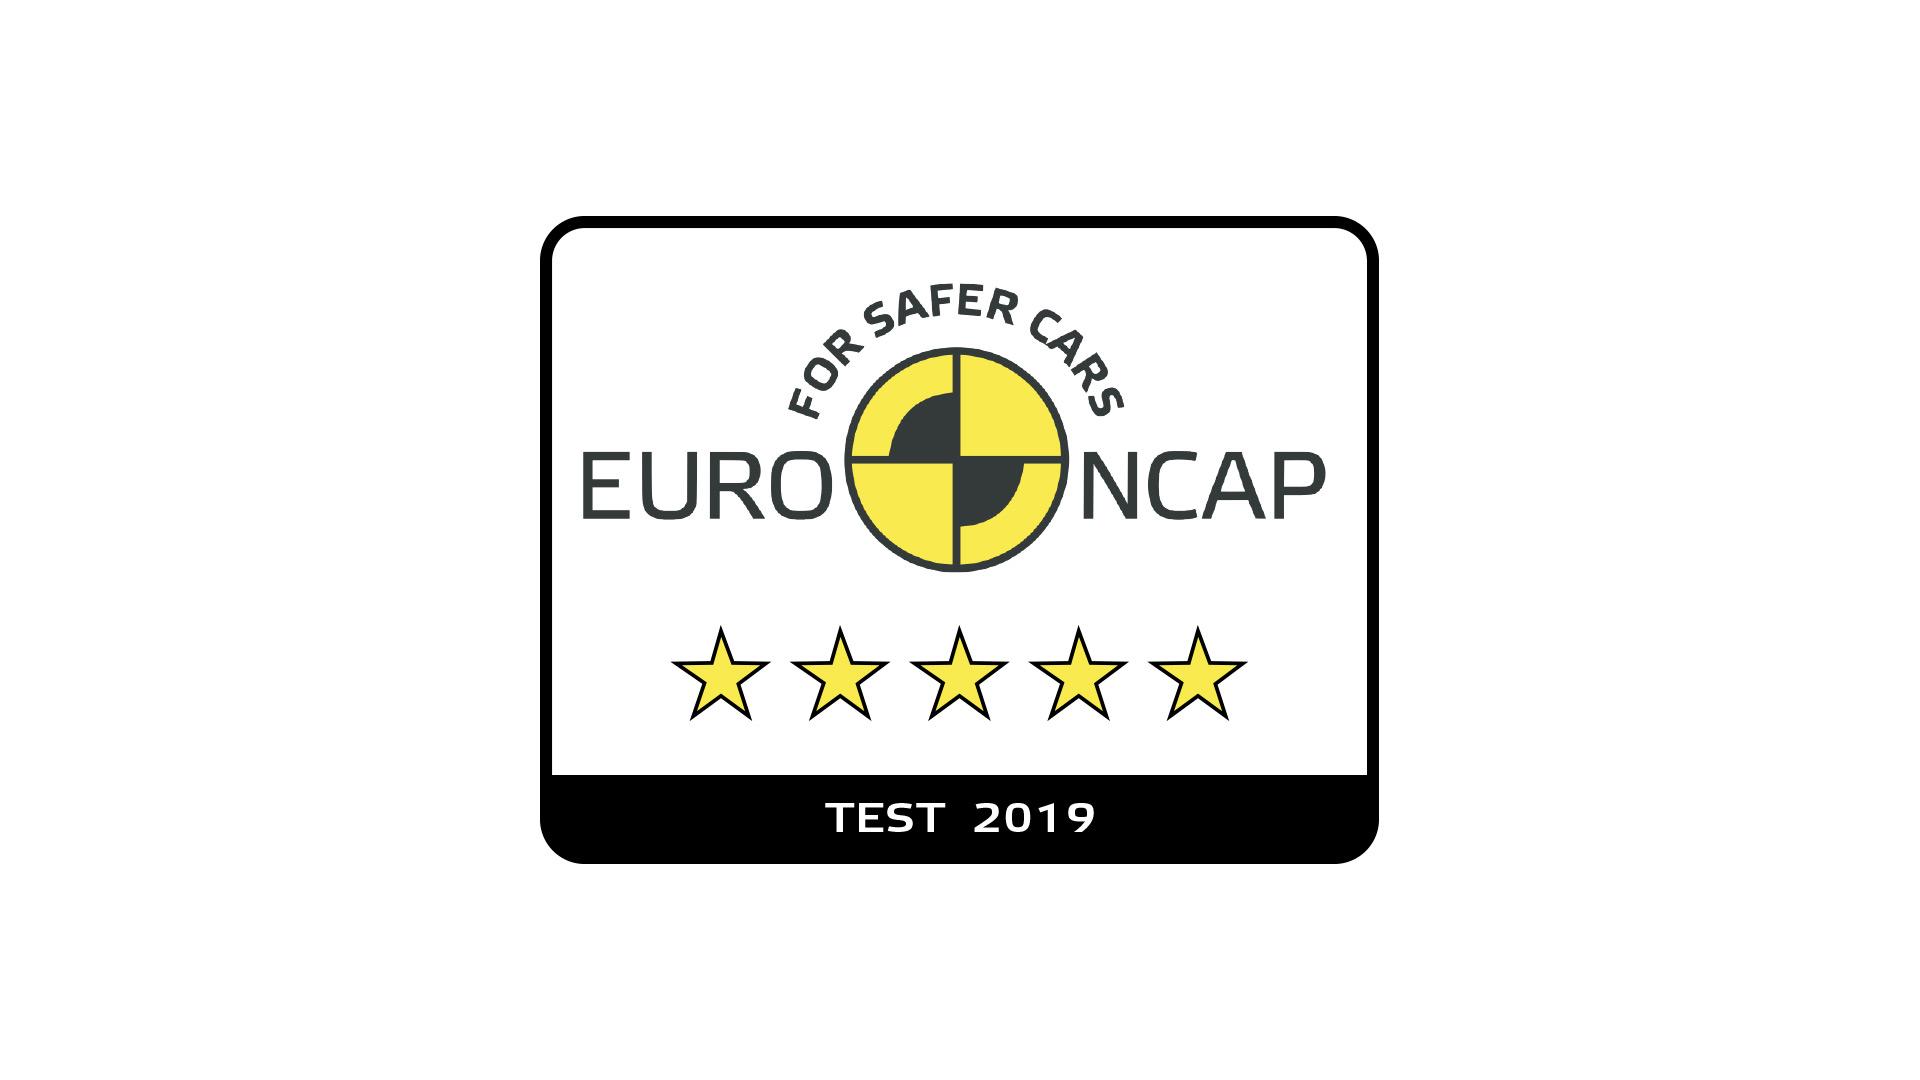 2020 lexus rxl hotspot euro ncap 5 star rating